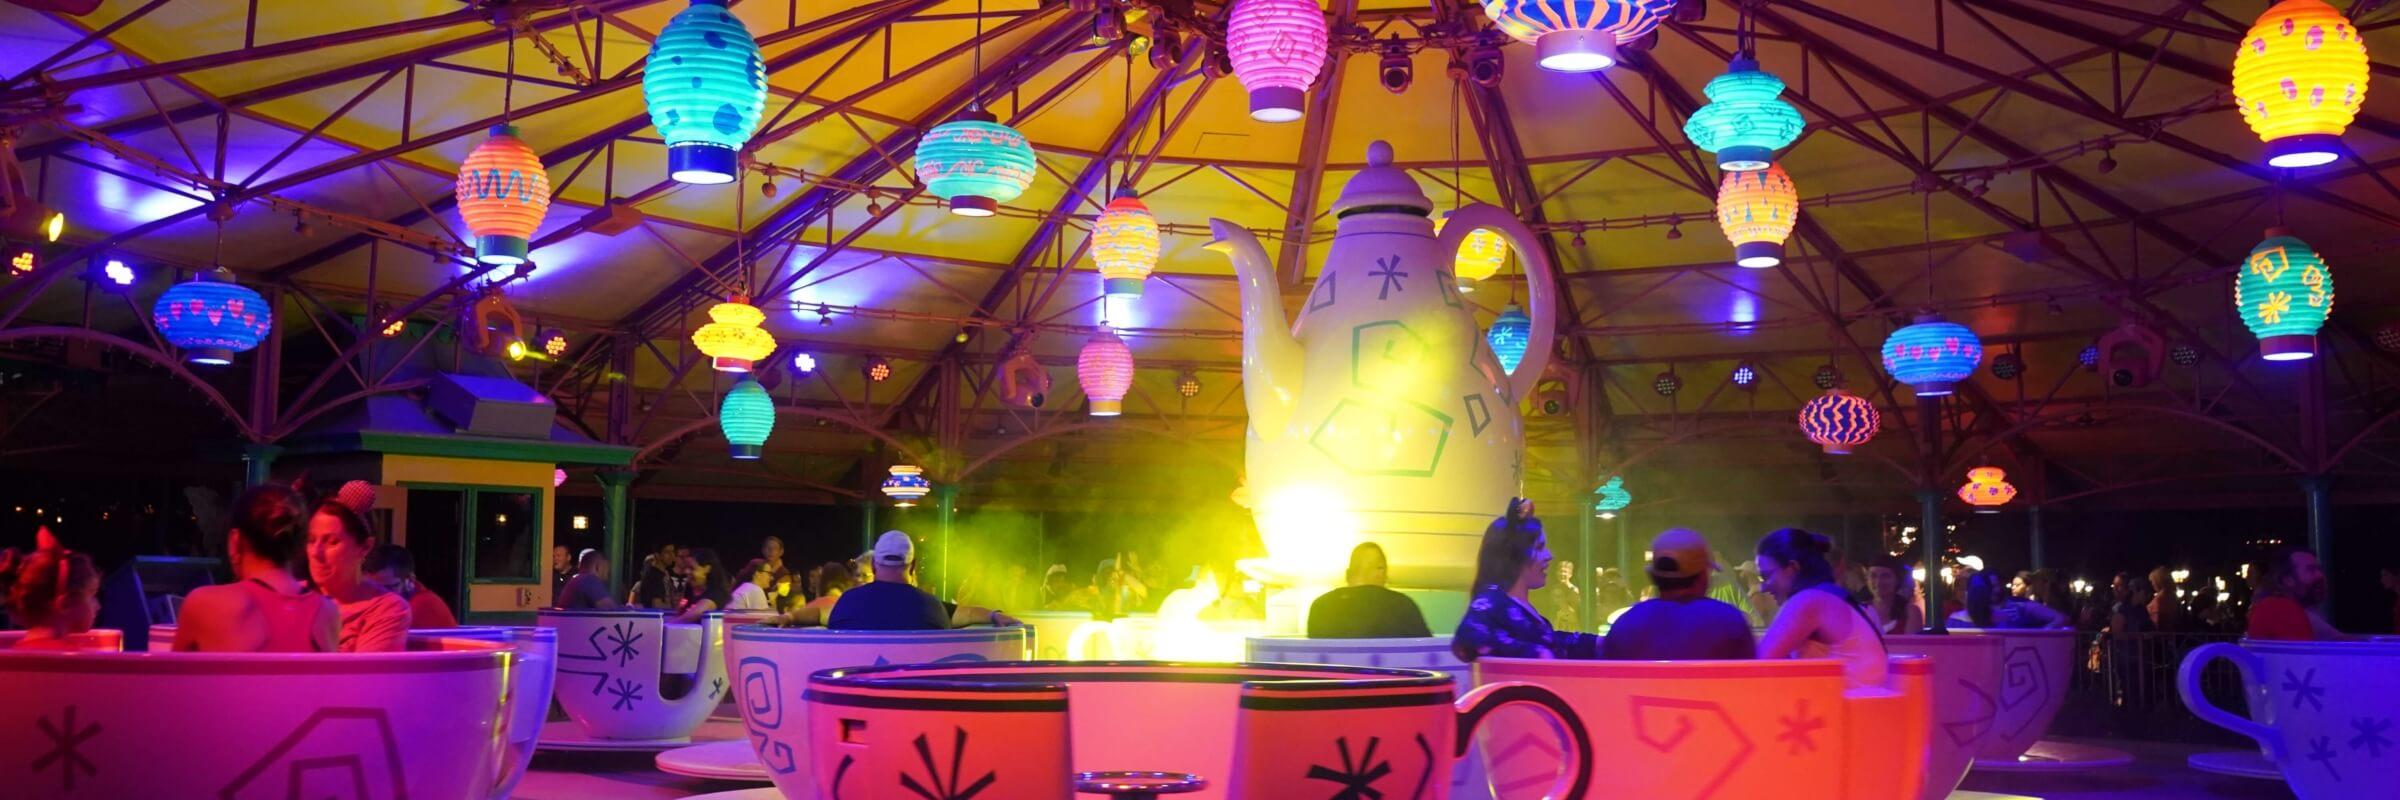 Mad Tea Party Teacups at Halloween in Magic Kingdom